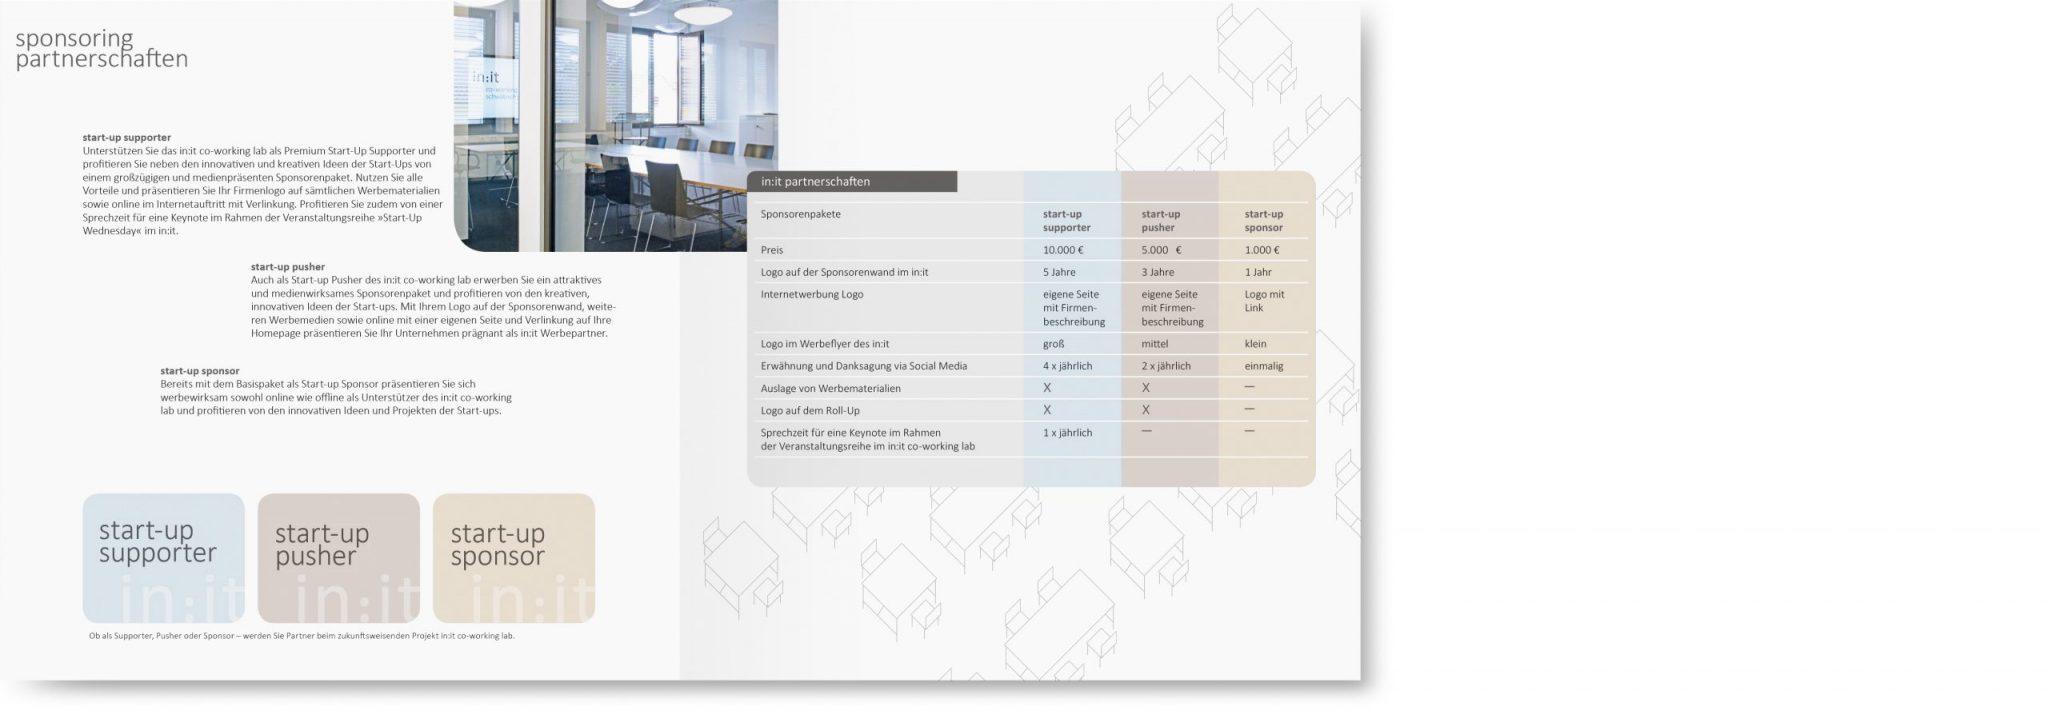 fh-web-init-sponsorenbroschuere-4-scaled.jpg